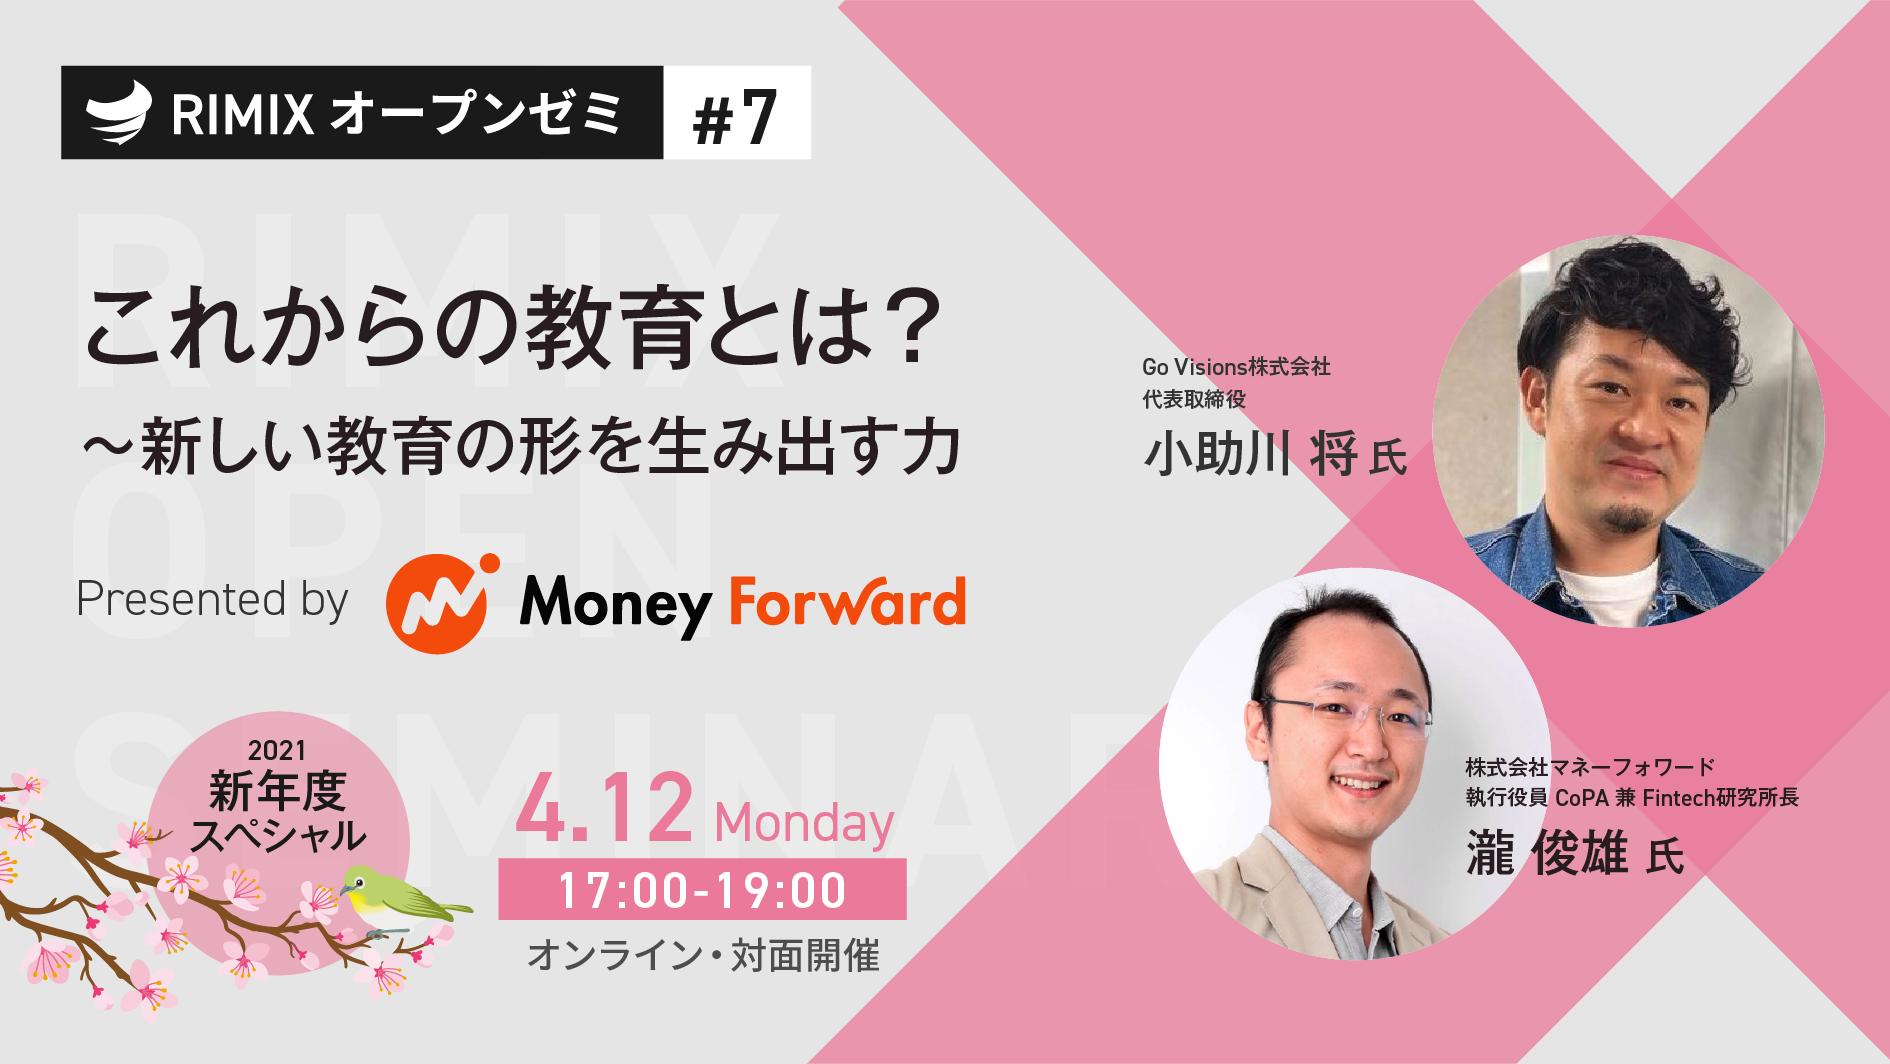 【RIMIXオープンゼミ#7】 これからの教育とは? 〜新しい教育の形を生み出す力〜Presented by Money forward